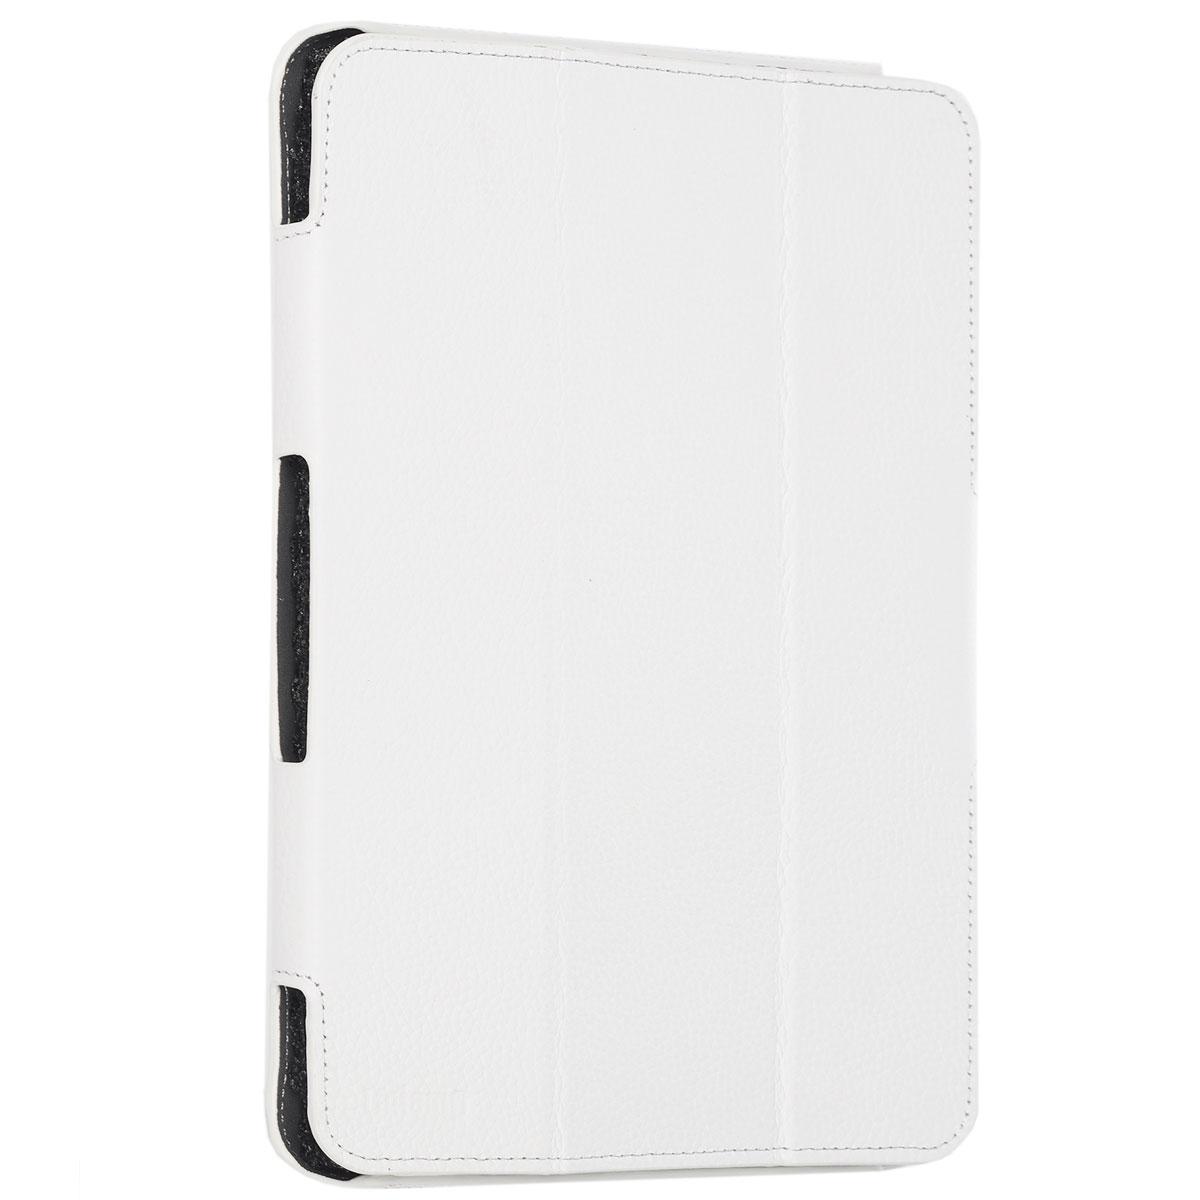 все цены на Untamo Alto чехол для Samsung Galaxy Tab 4 10.1, White онлайн